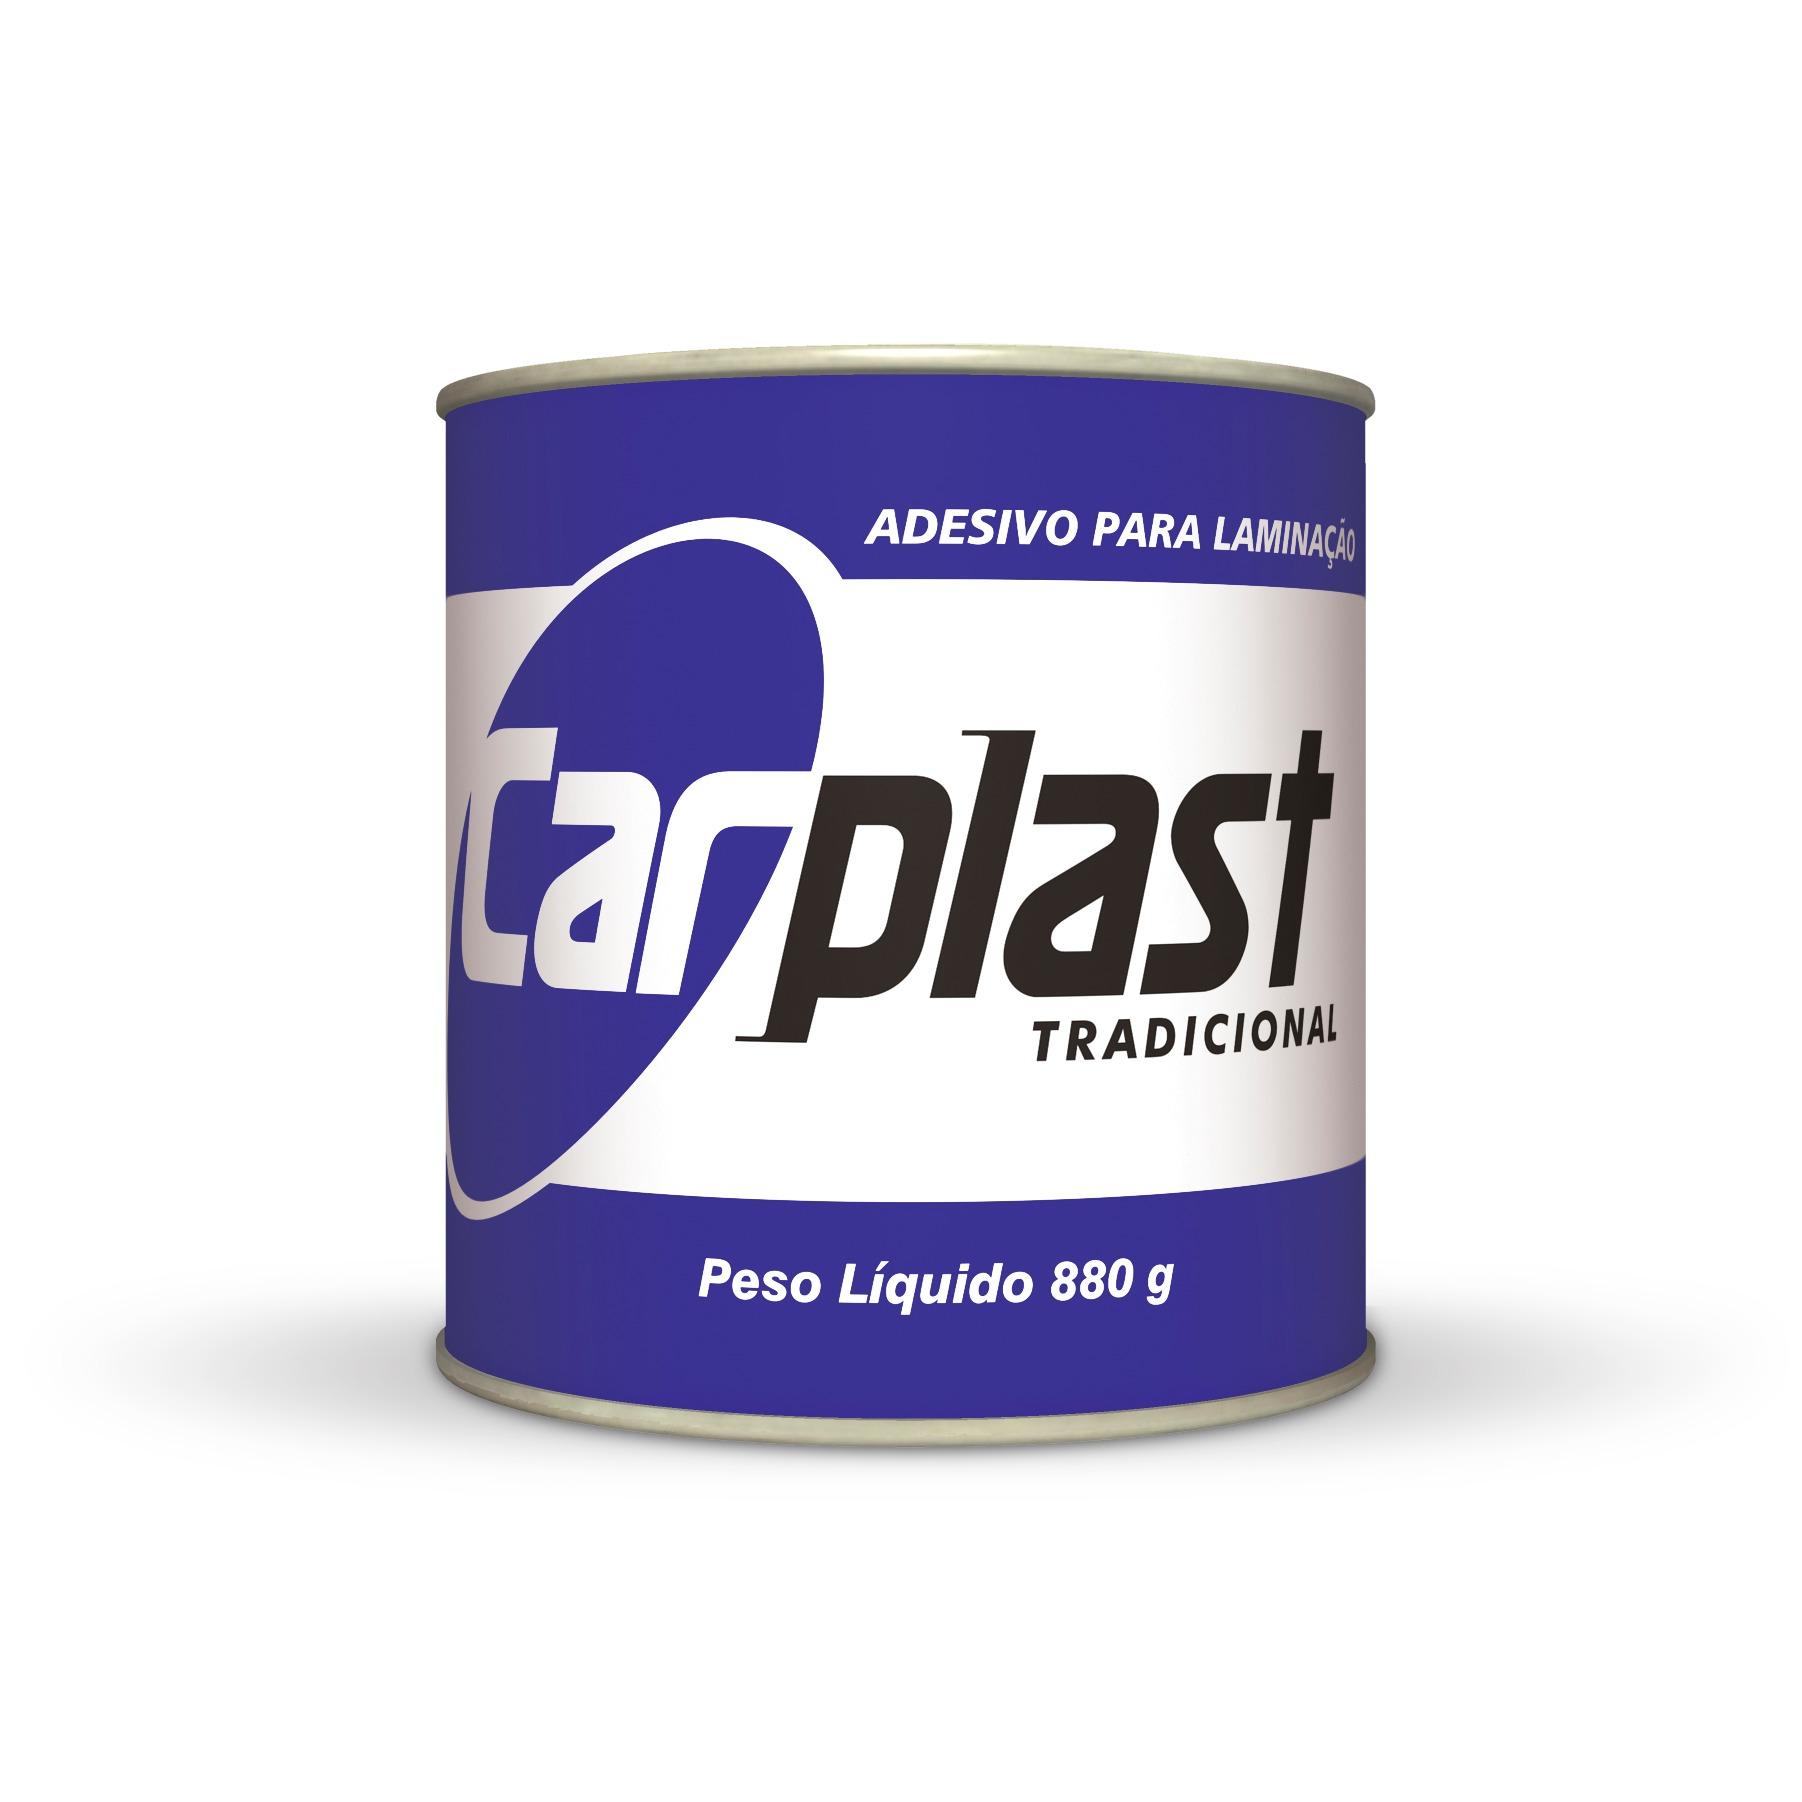 Carplast Lamination Adhesive